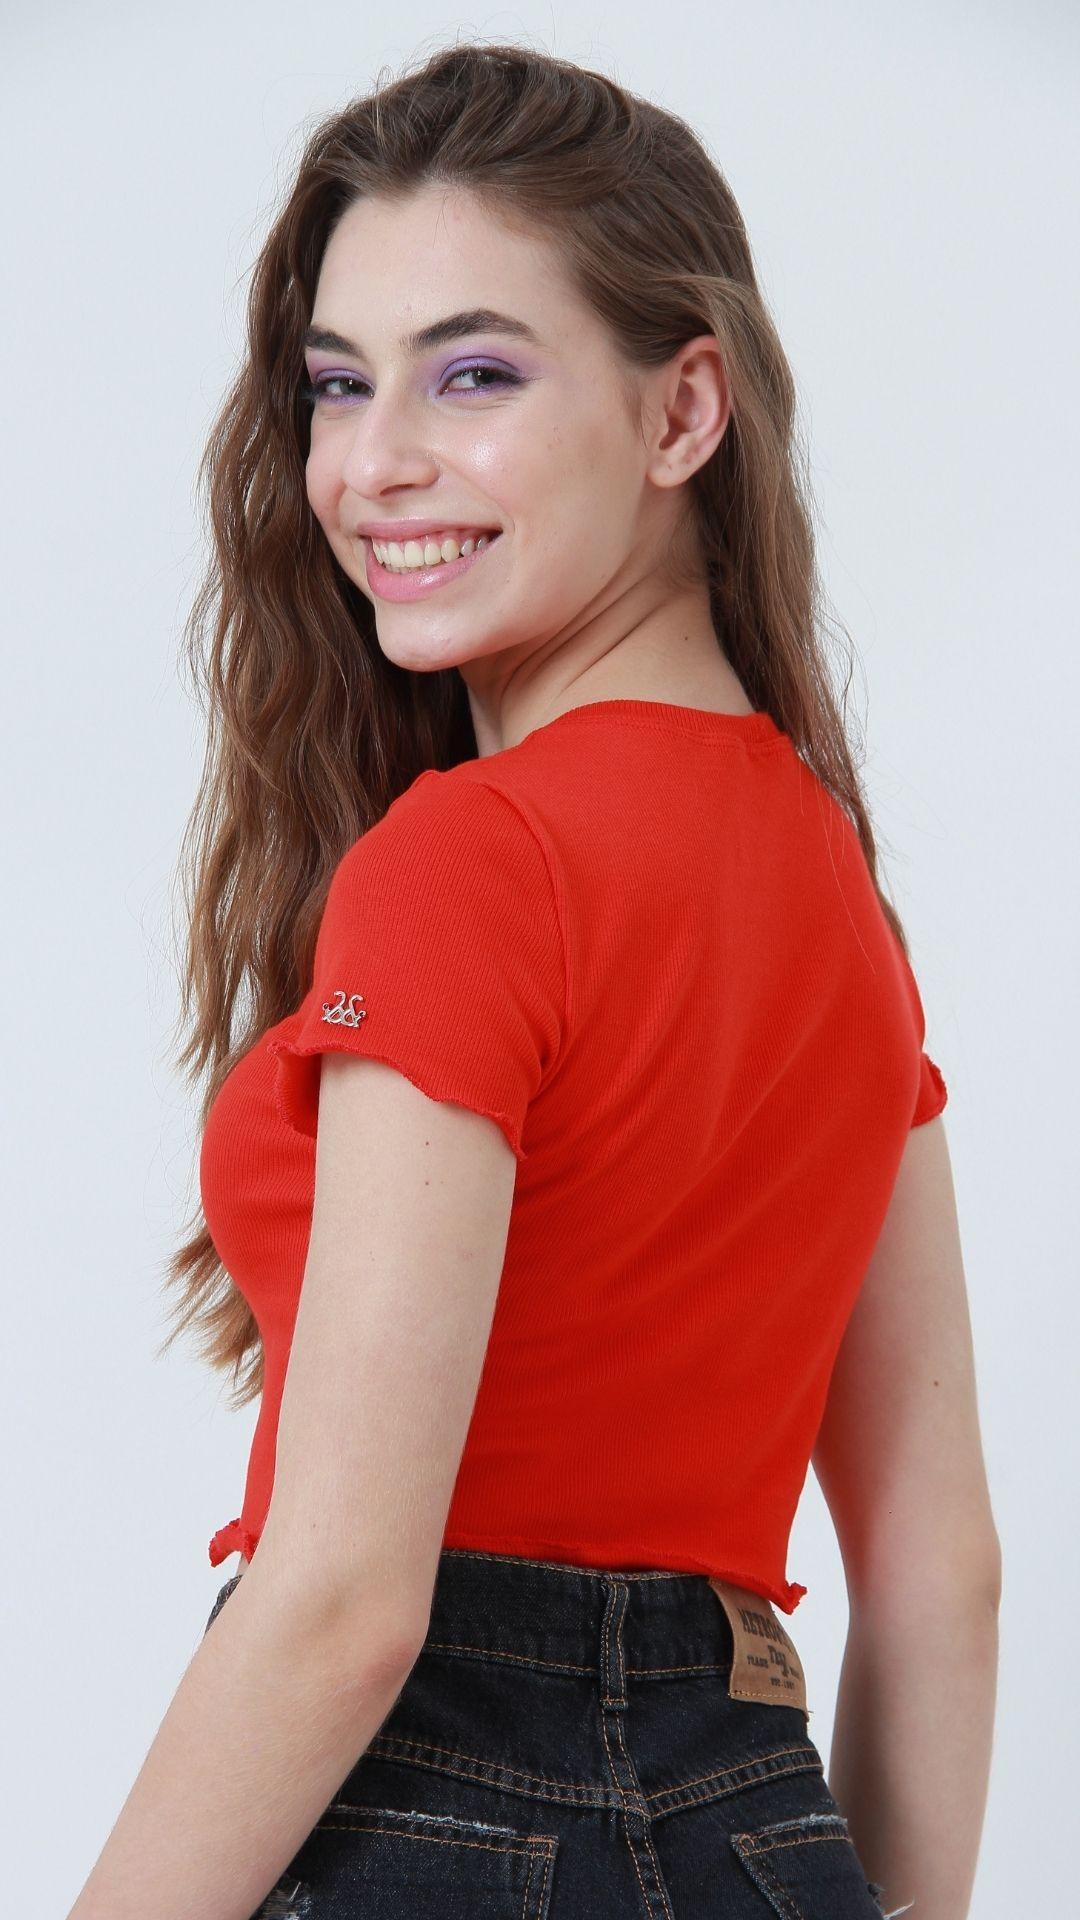 T-shirt Ribbed Vermelho  - Metro & Co.